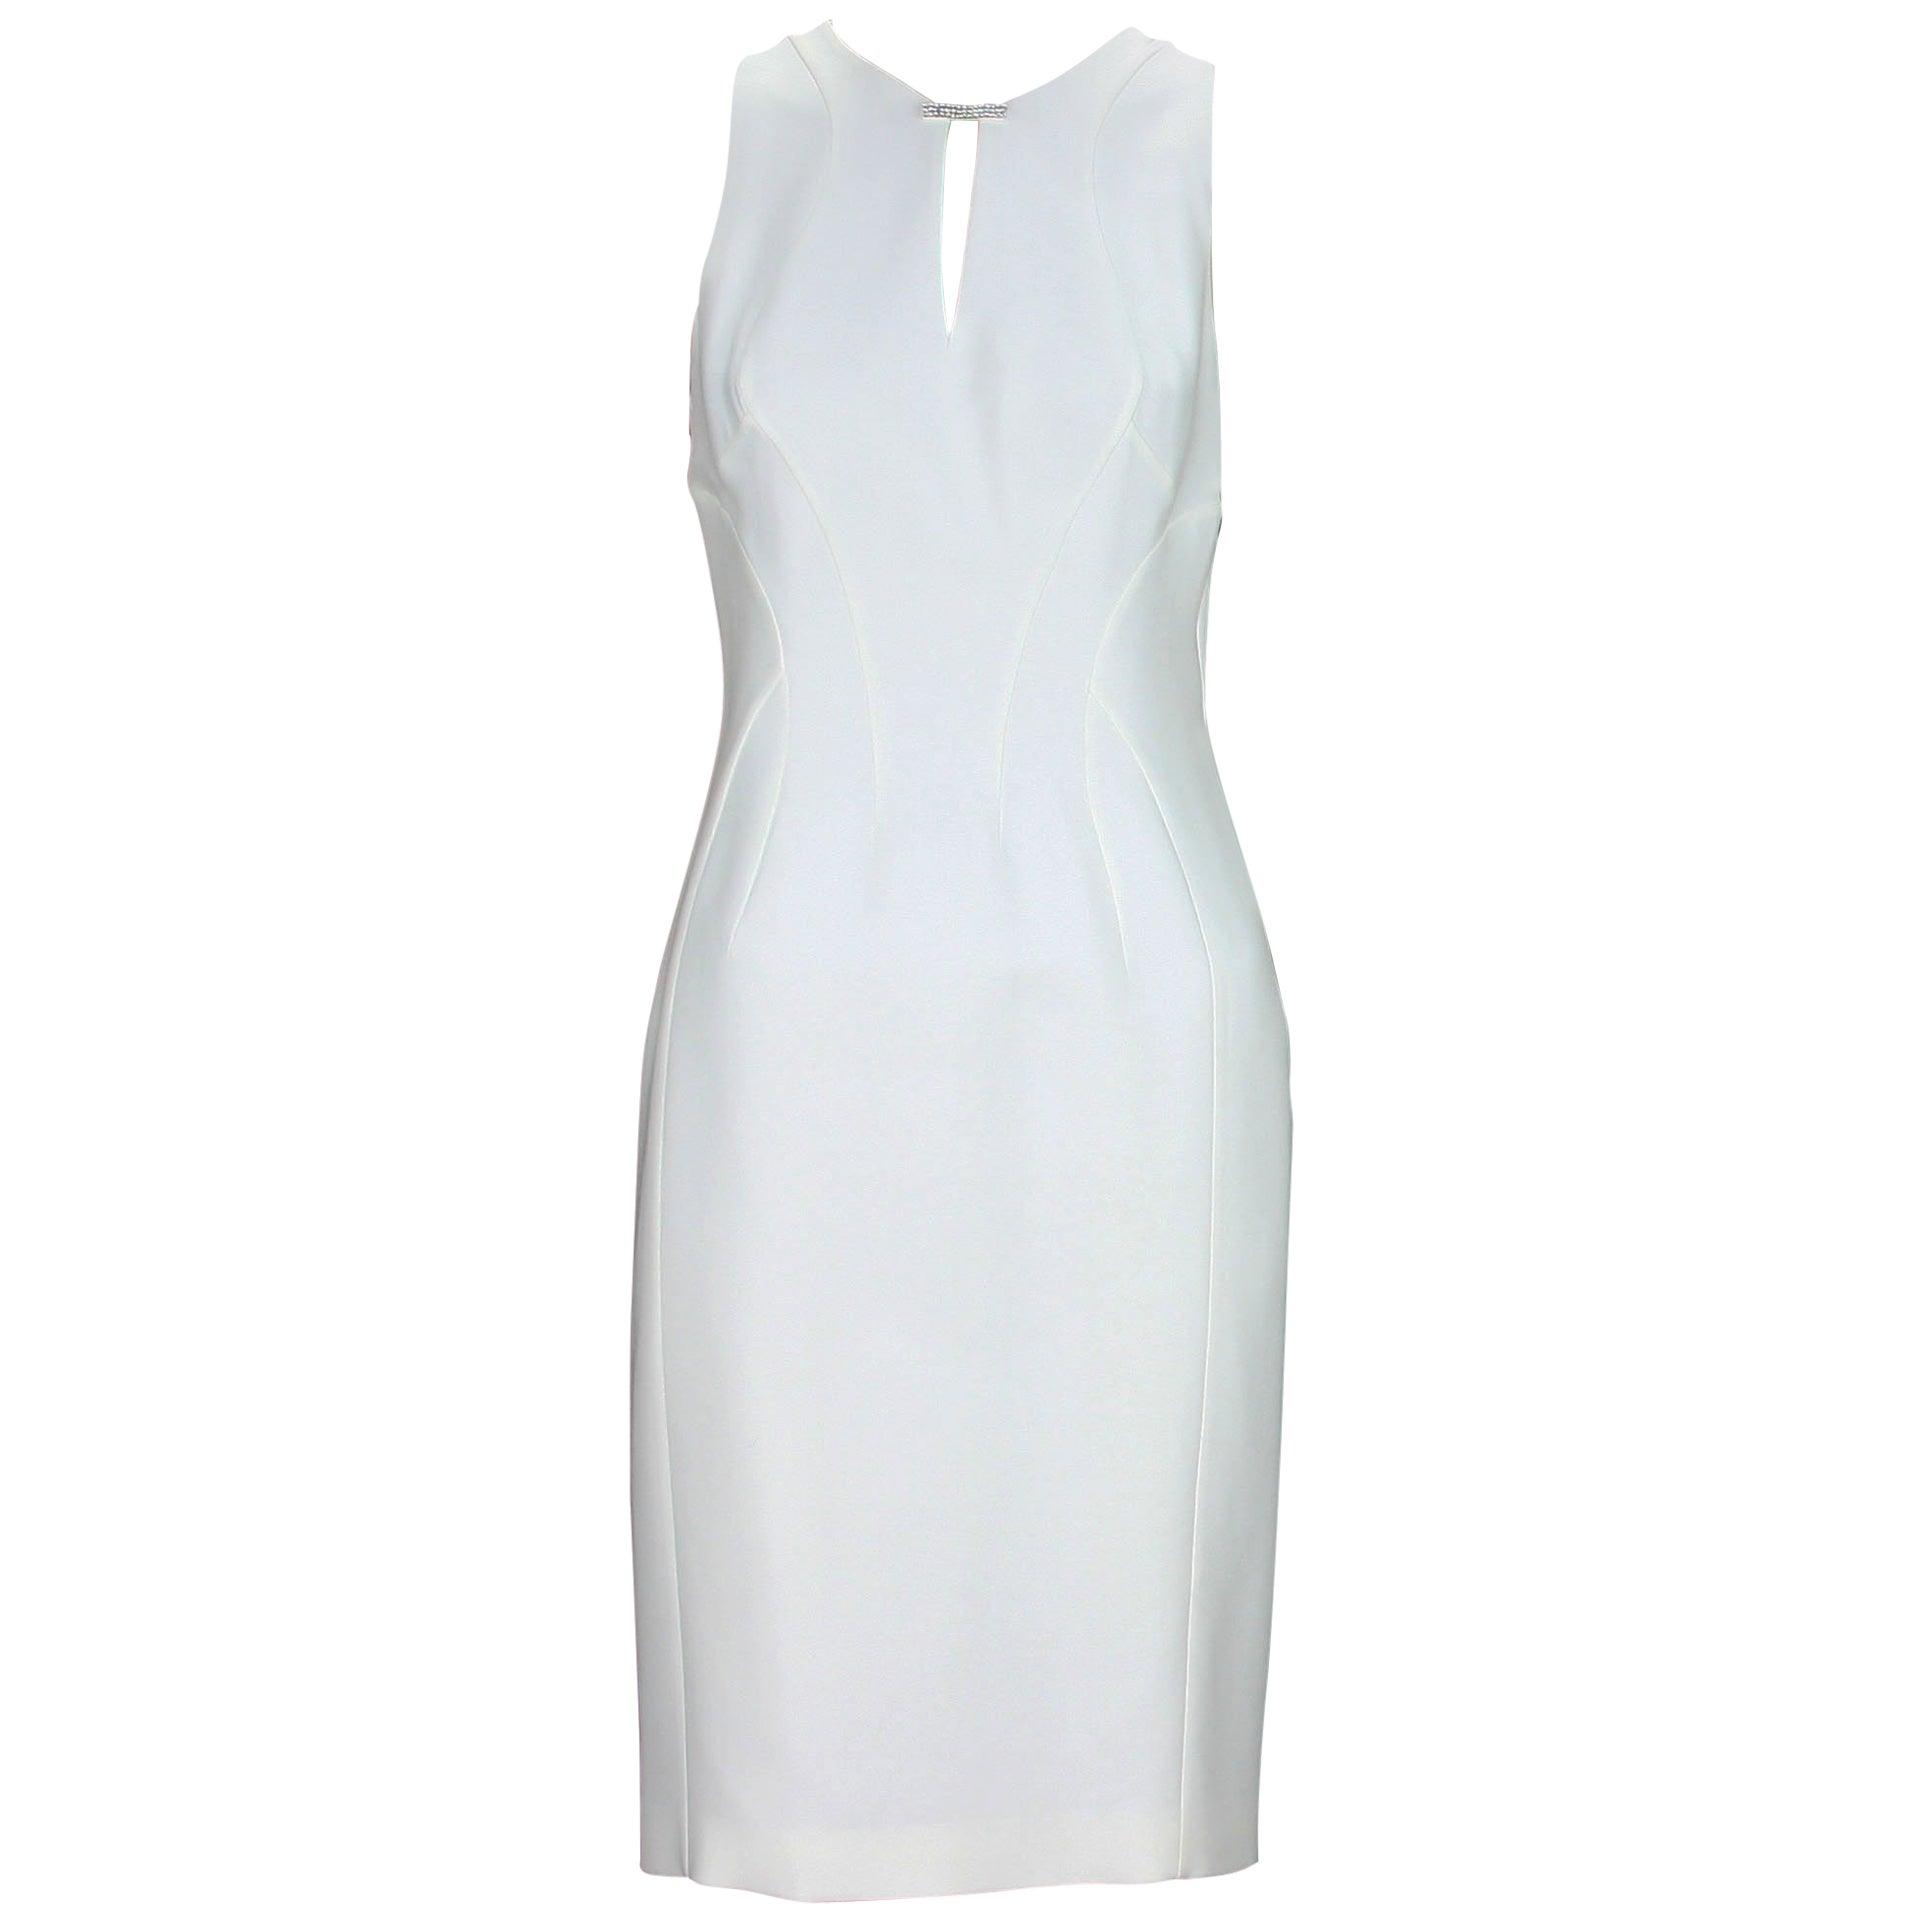 New Versace White Silk Cocktail Dress with Swarovski Crystals It 40 -US 6